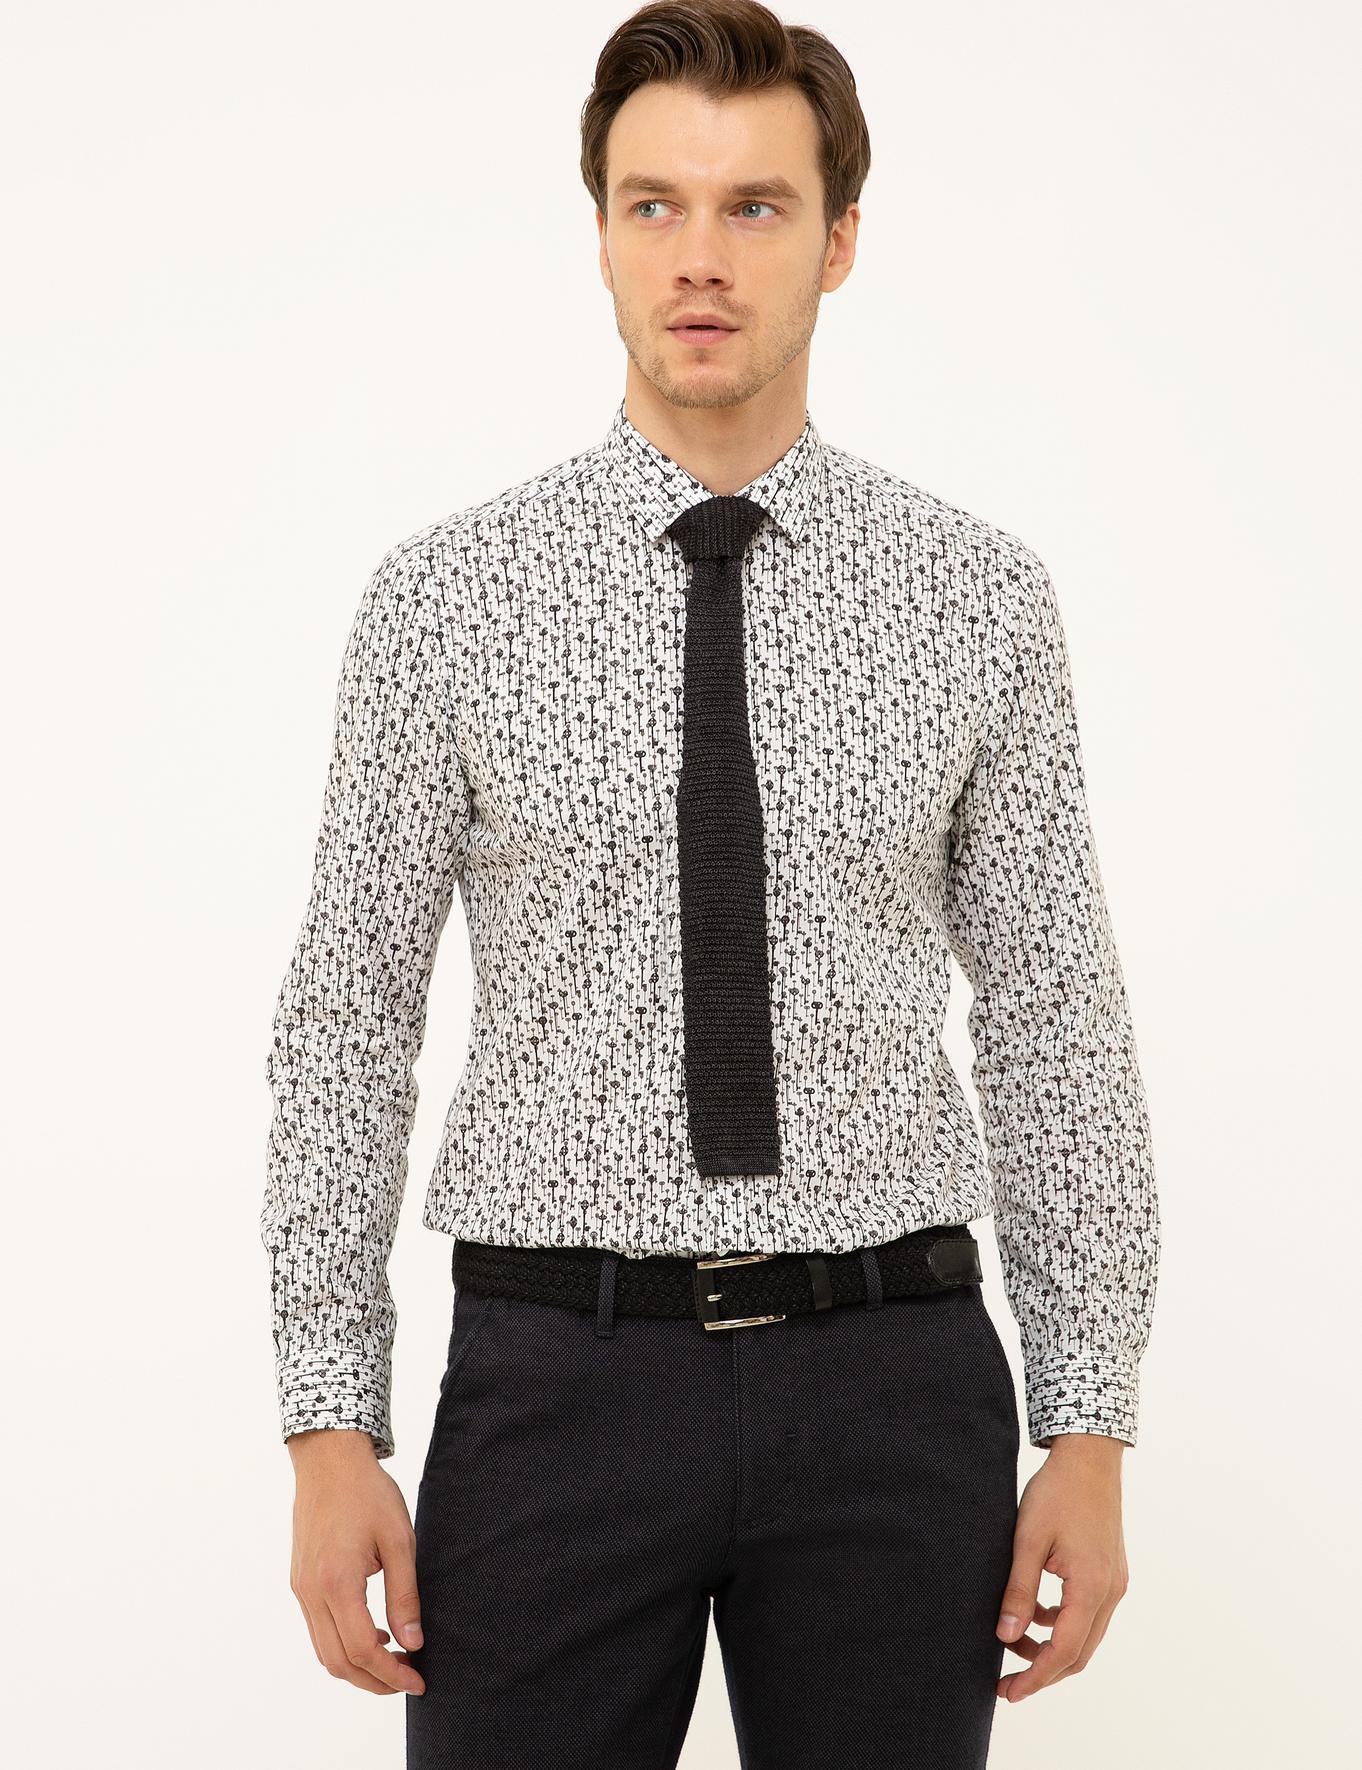 Beyaz Slim Fit Gömlek - 50210012023